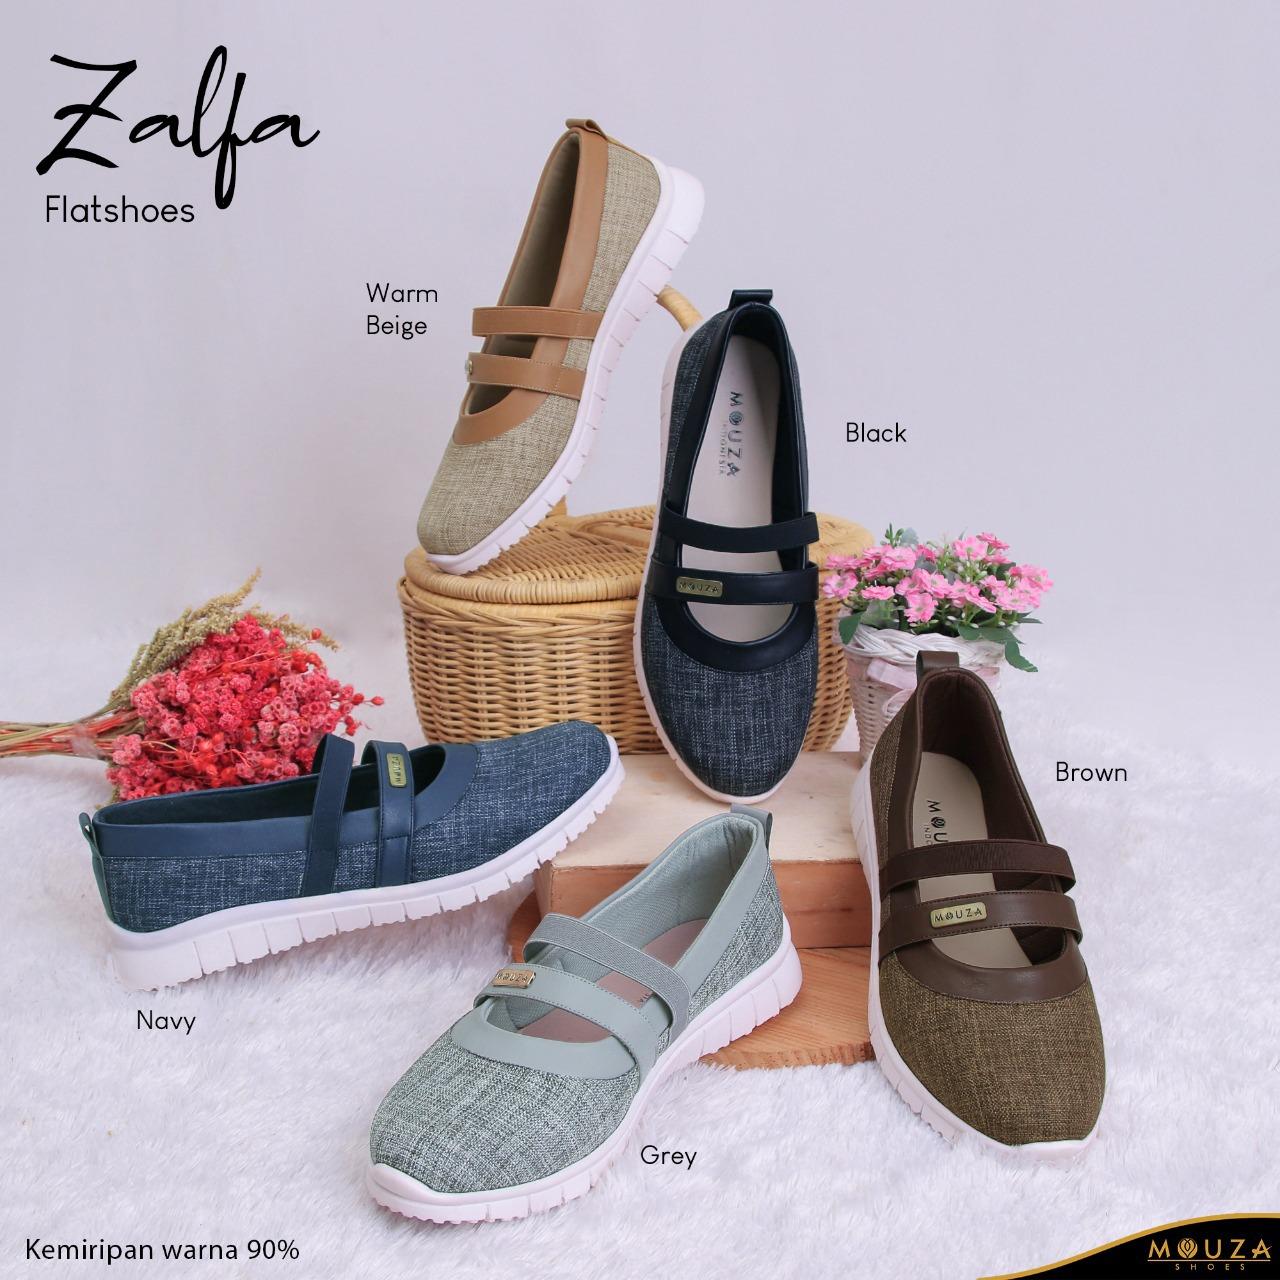 Zalfa Flatshoes